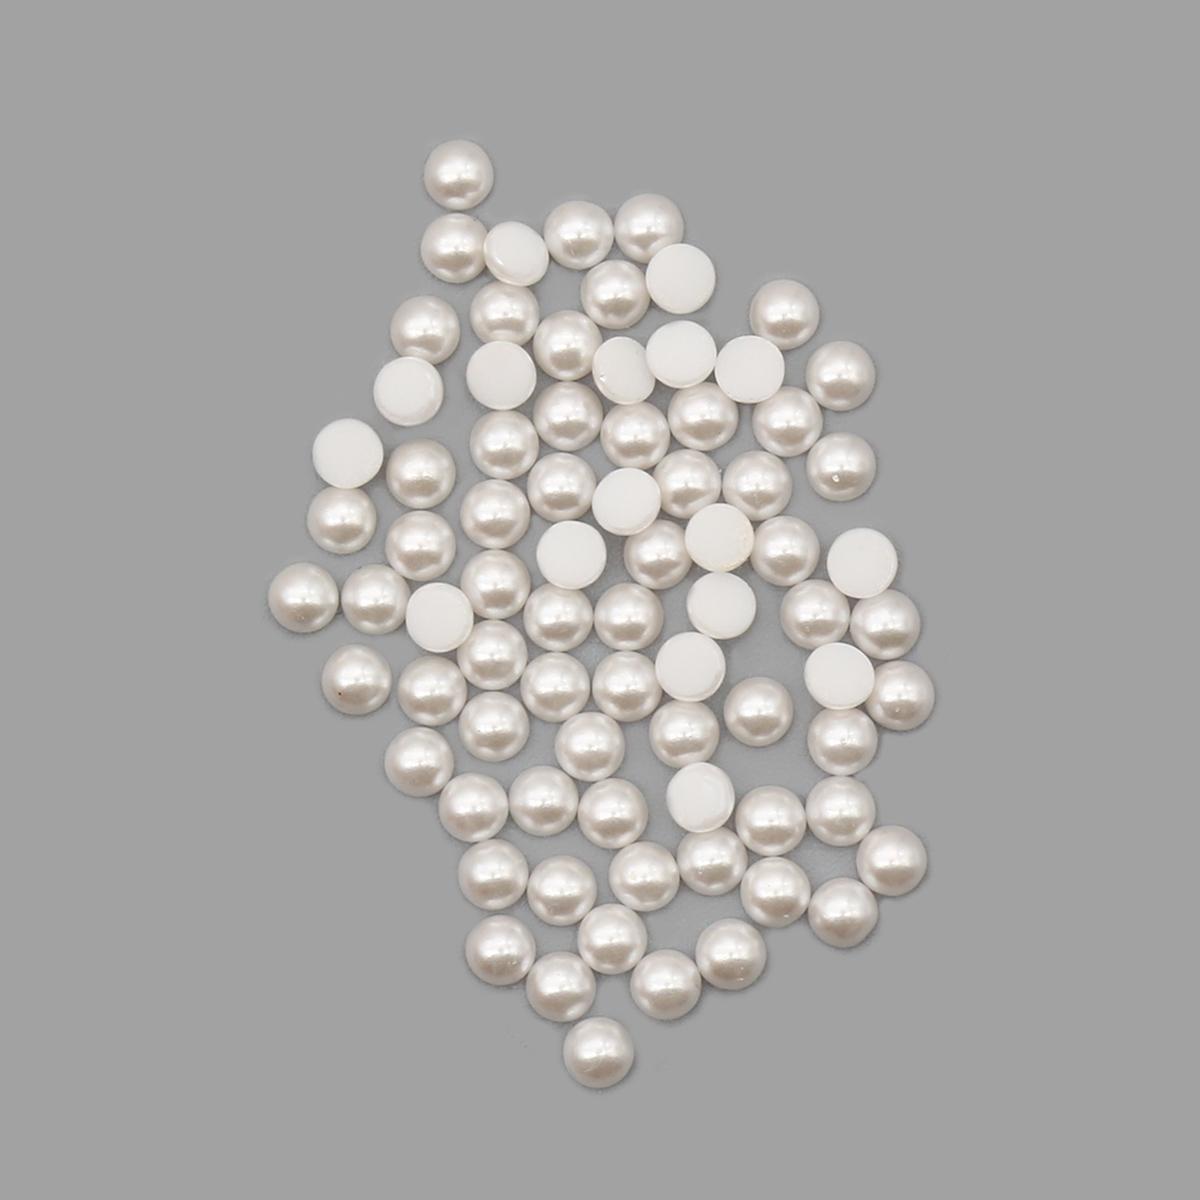 131-11-030 Кабошоны (жемчуг) White 3мм. 80 шт. Preciosa